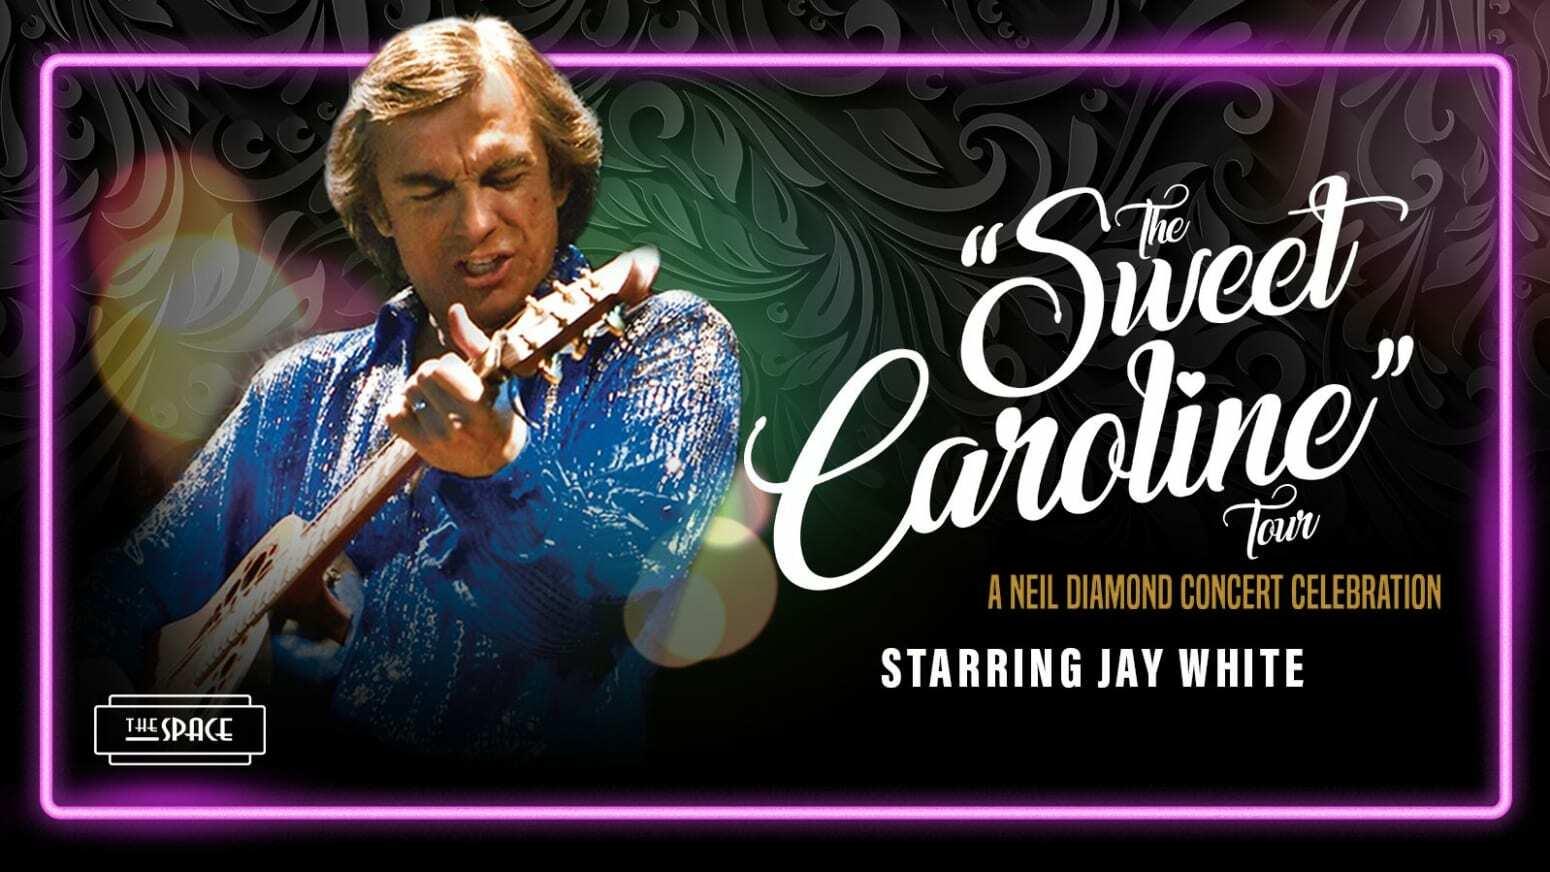 """The Sweet Caroline Tour"": Neil Diamond Concert Celebration"